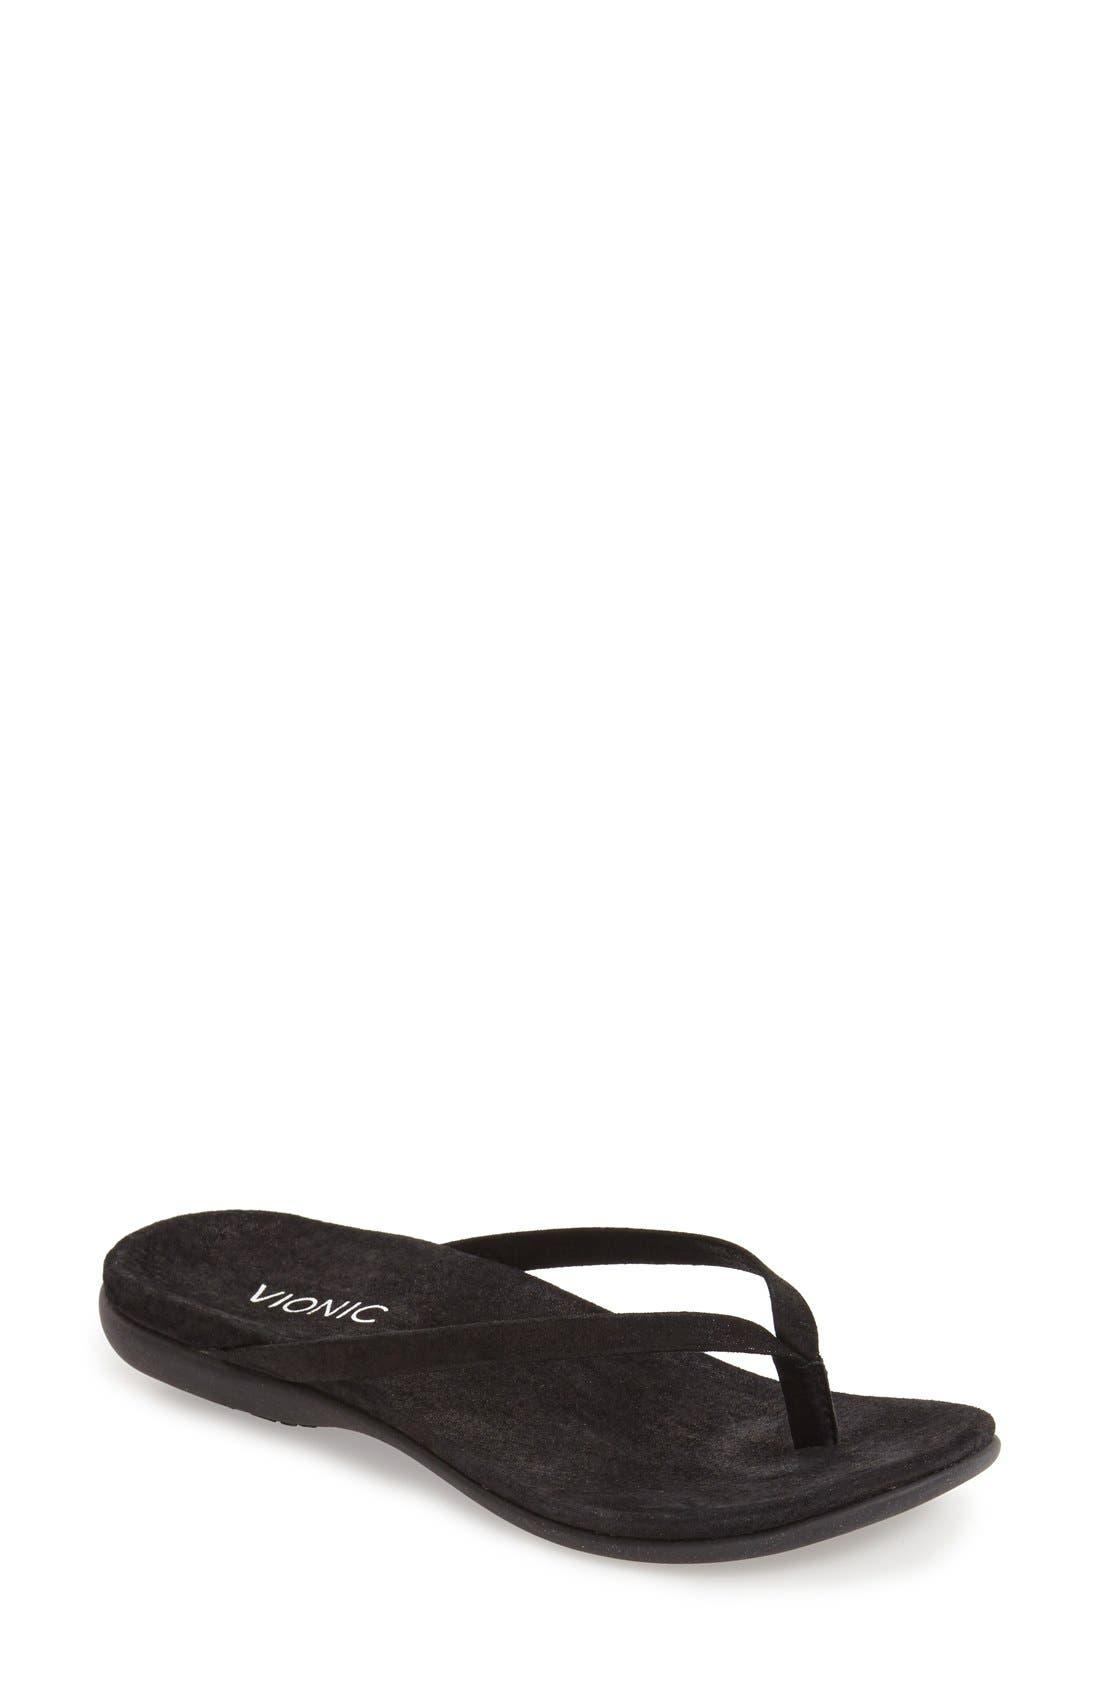 Alternate Image 1 Selected - Vionic 'Corfu' Sandal (Women)